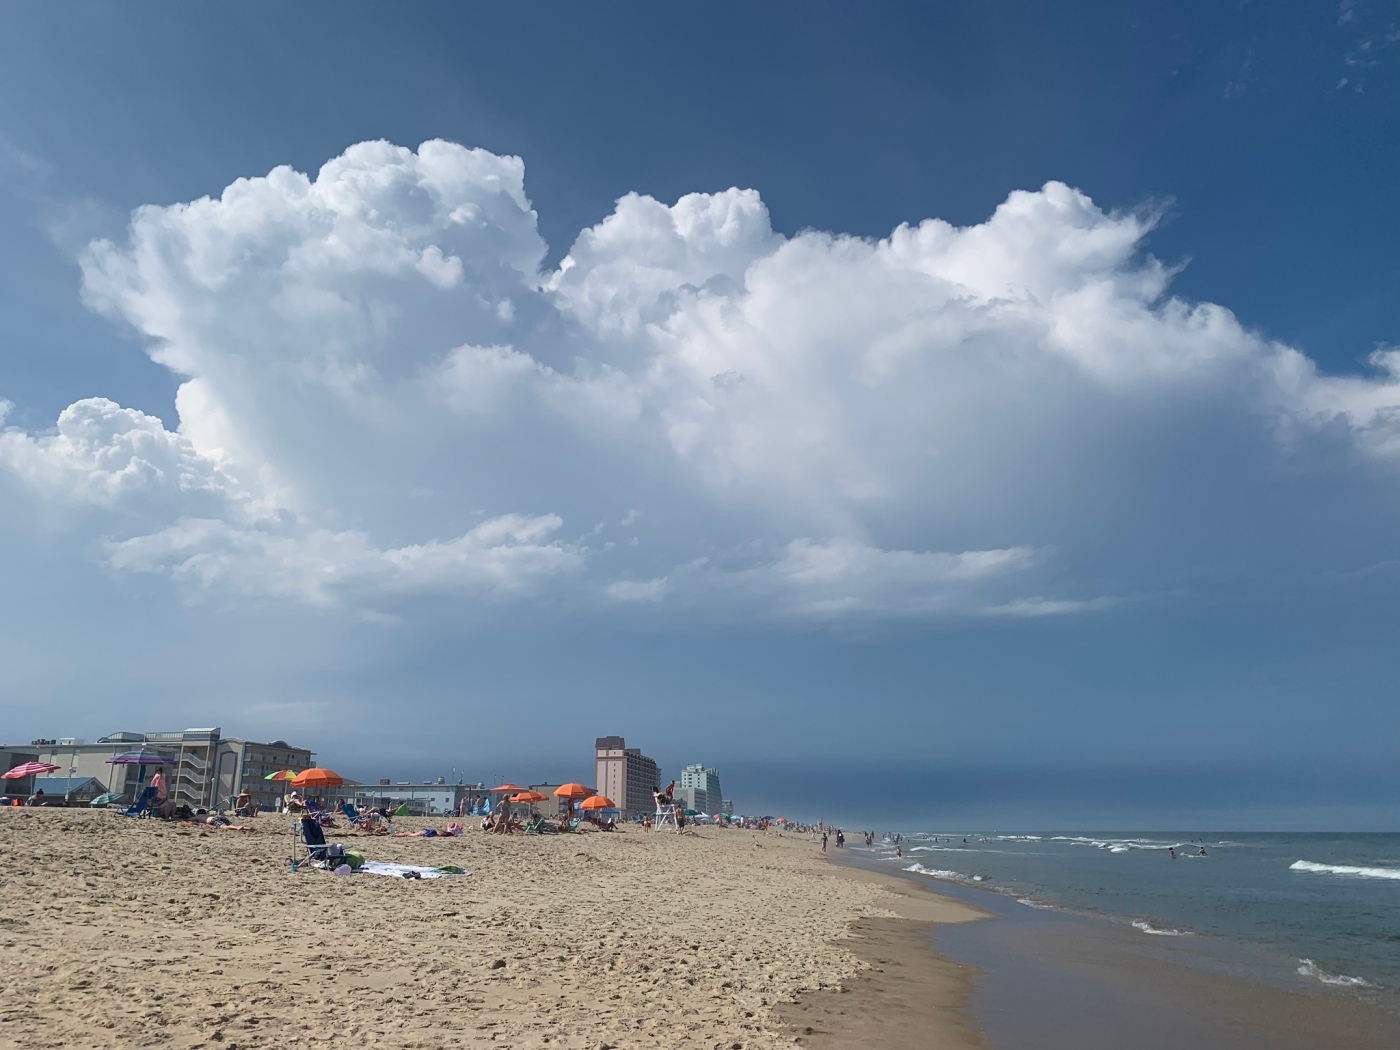 Thunderstorms Developing over Ocean View, Delaware